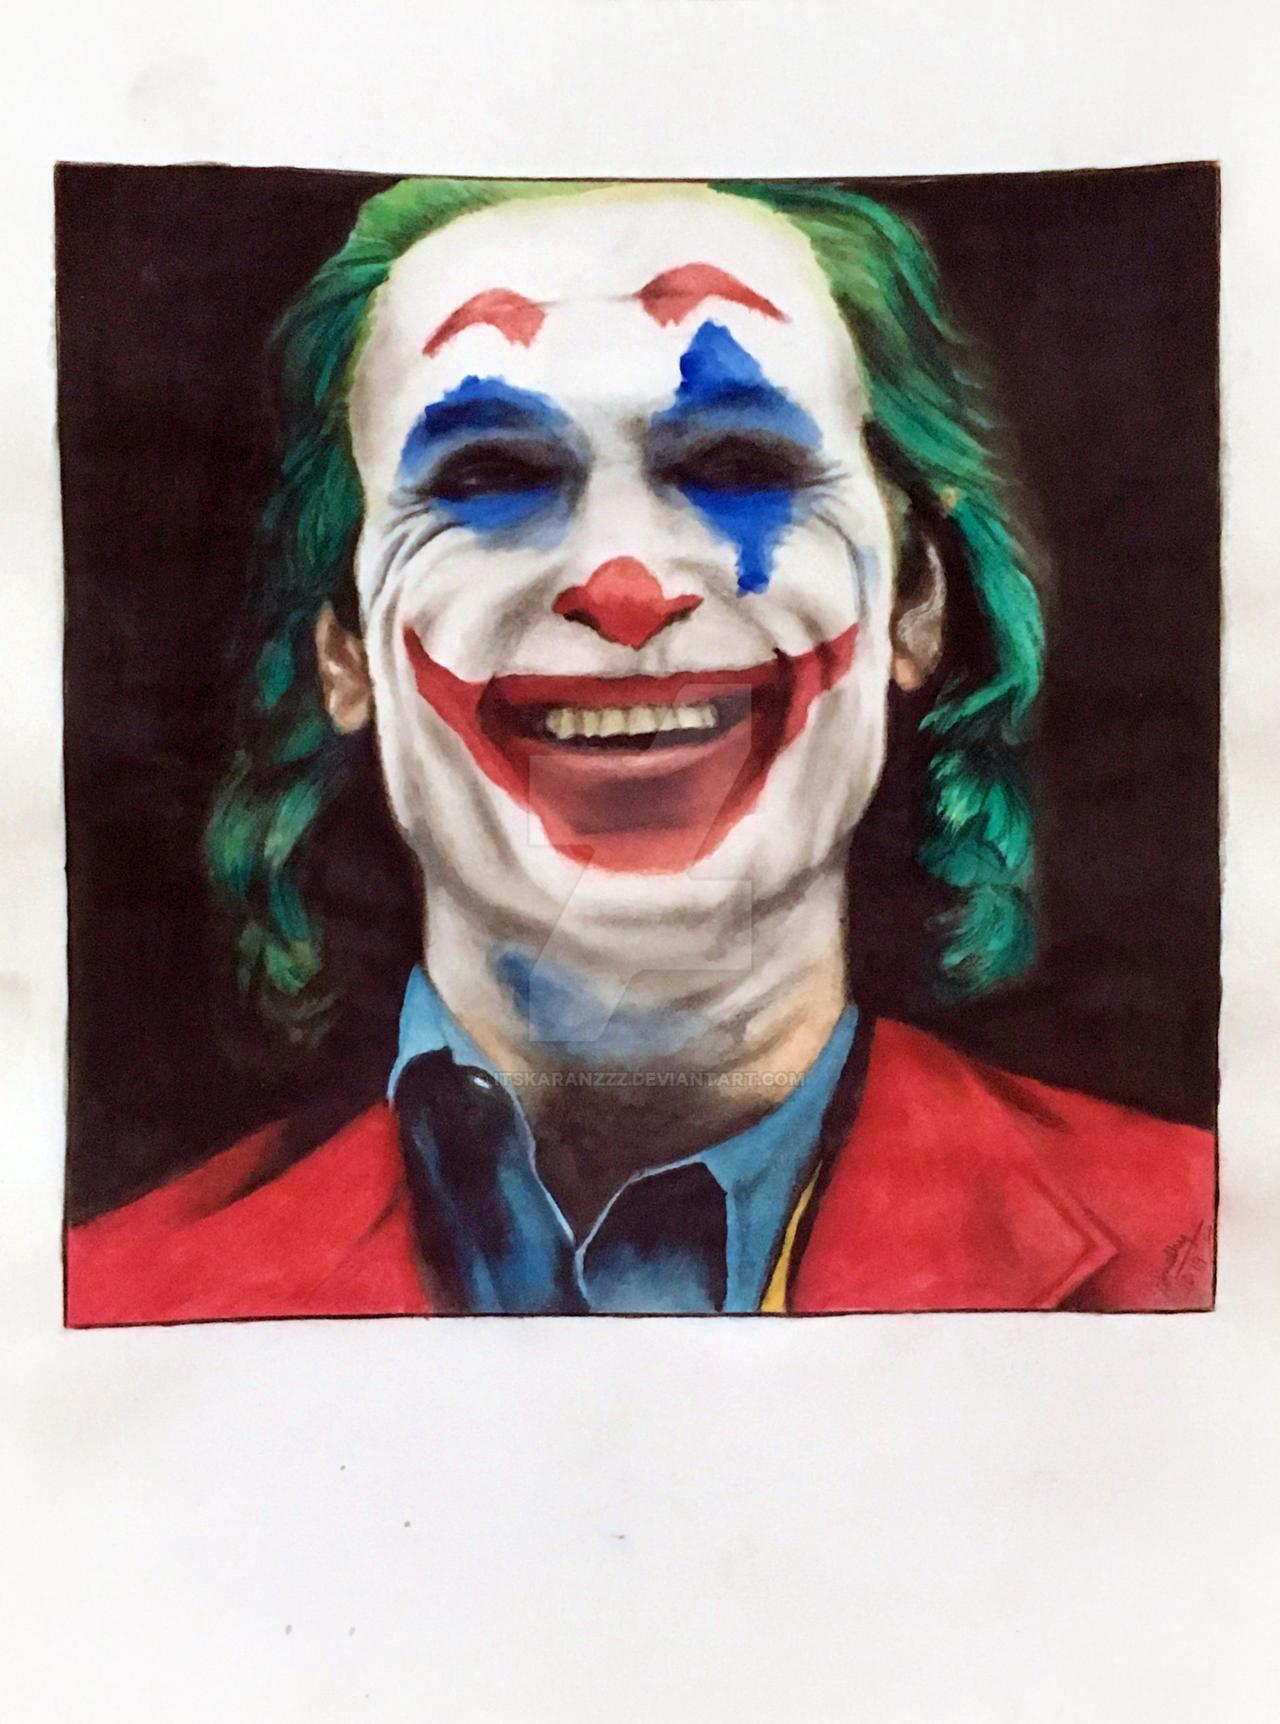 Joker 2019 By Itskaranzzz On Deviantart